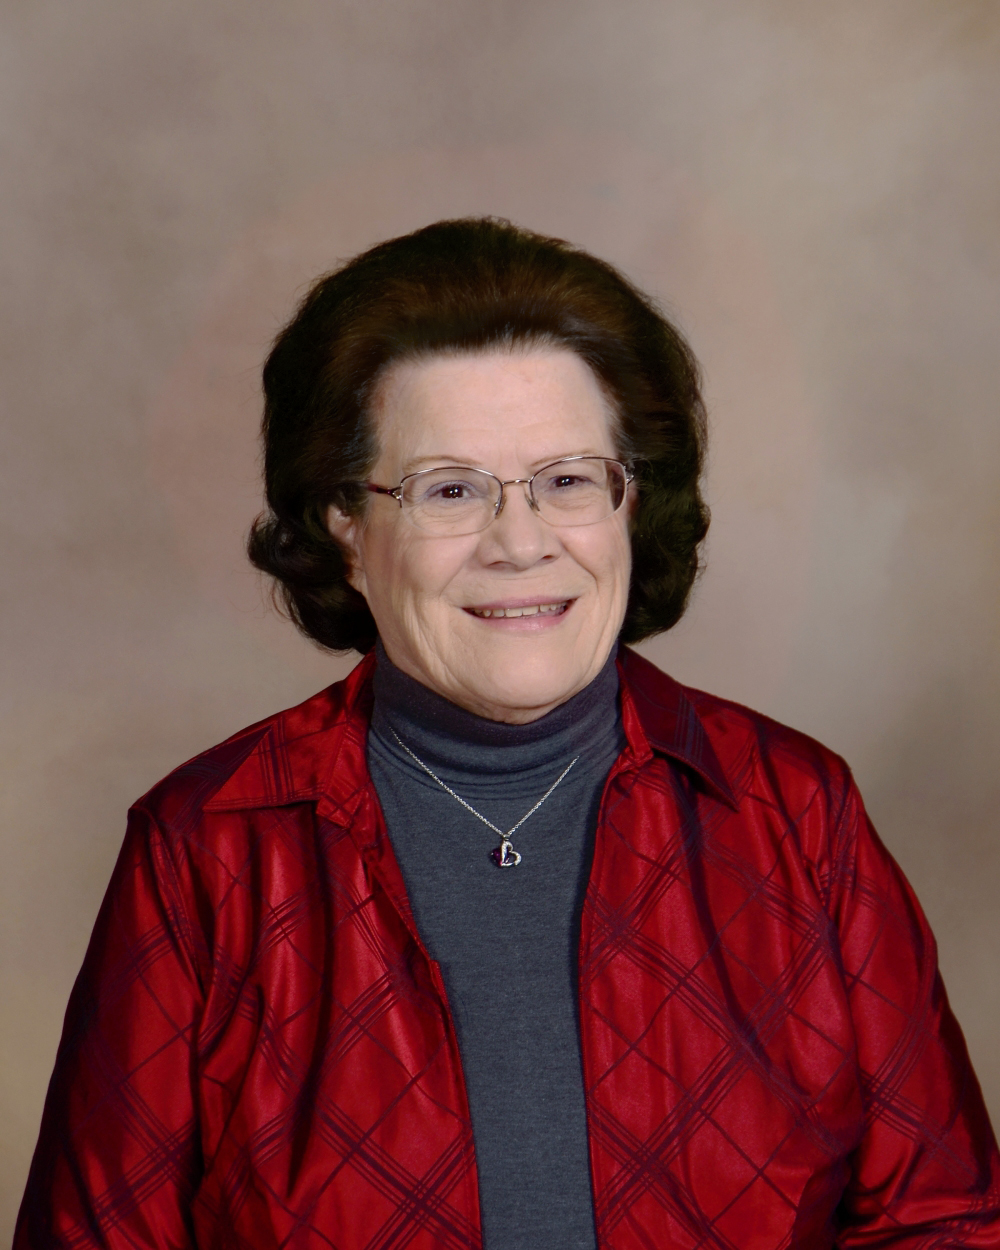 Mrs. Anita Dunn